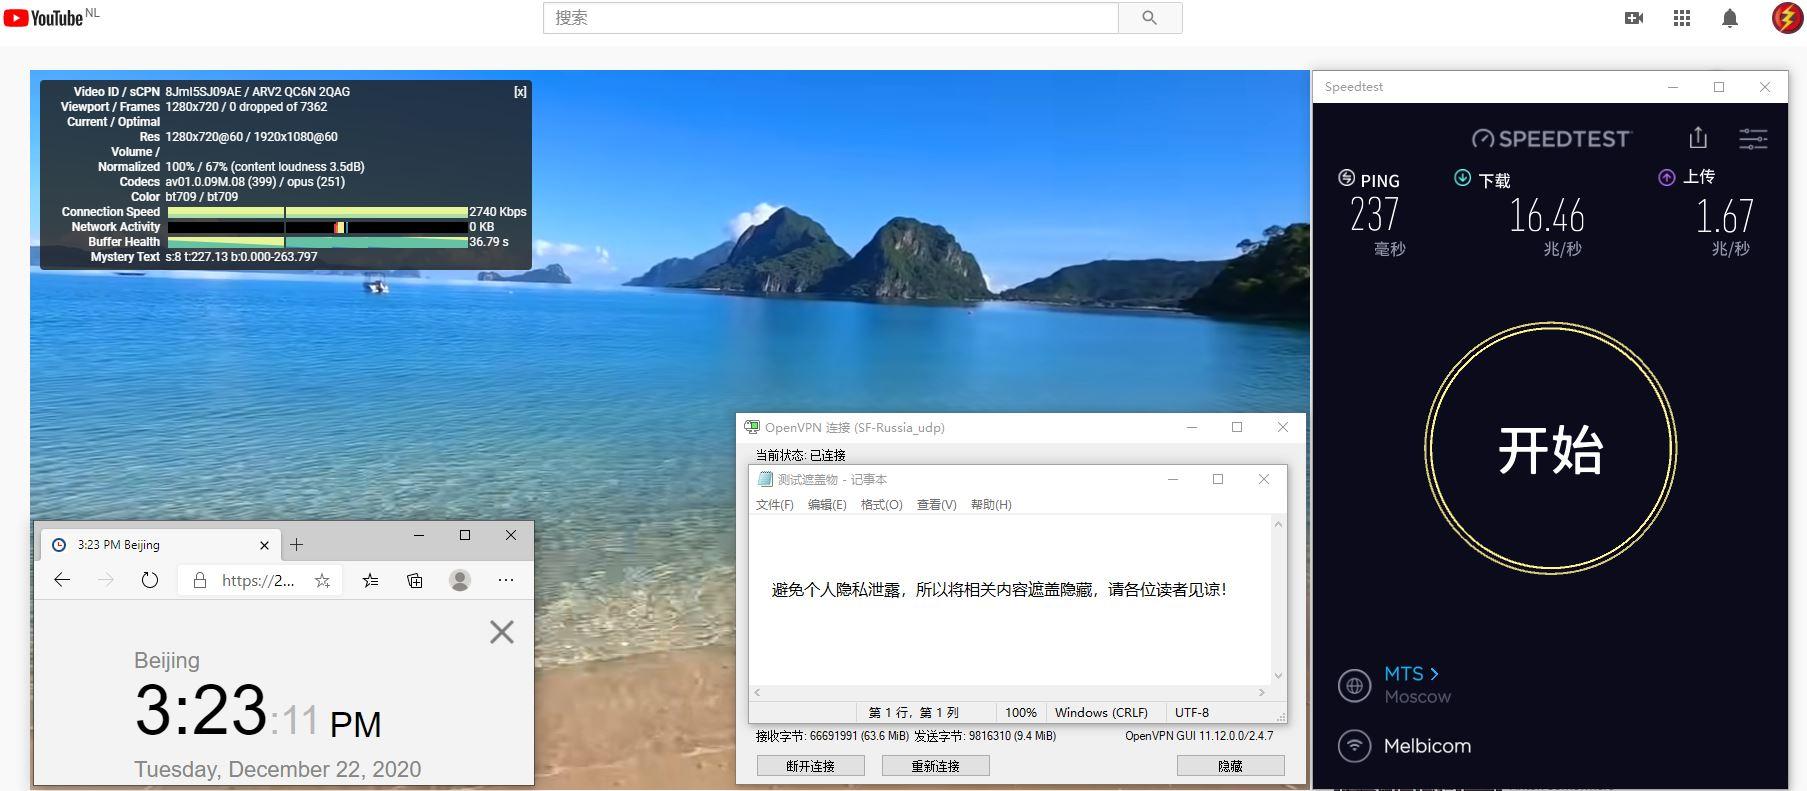 Windows10 SurfsharkVPN Russia 服务器 中国VPN 翻墙 科学上网 测试 - 20201222